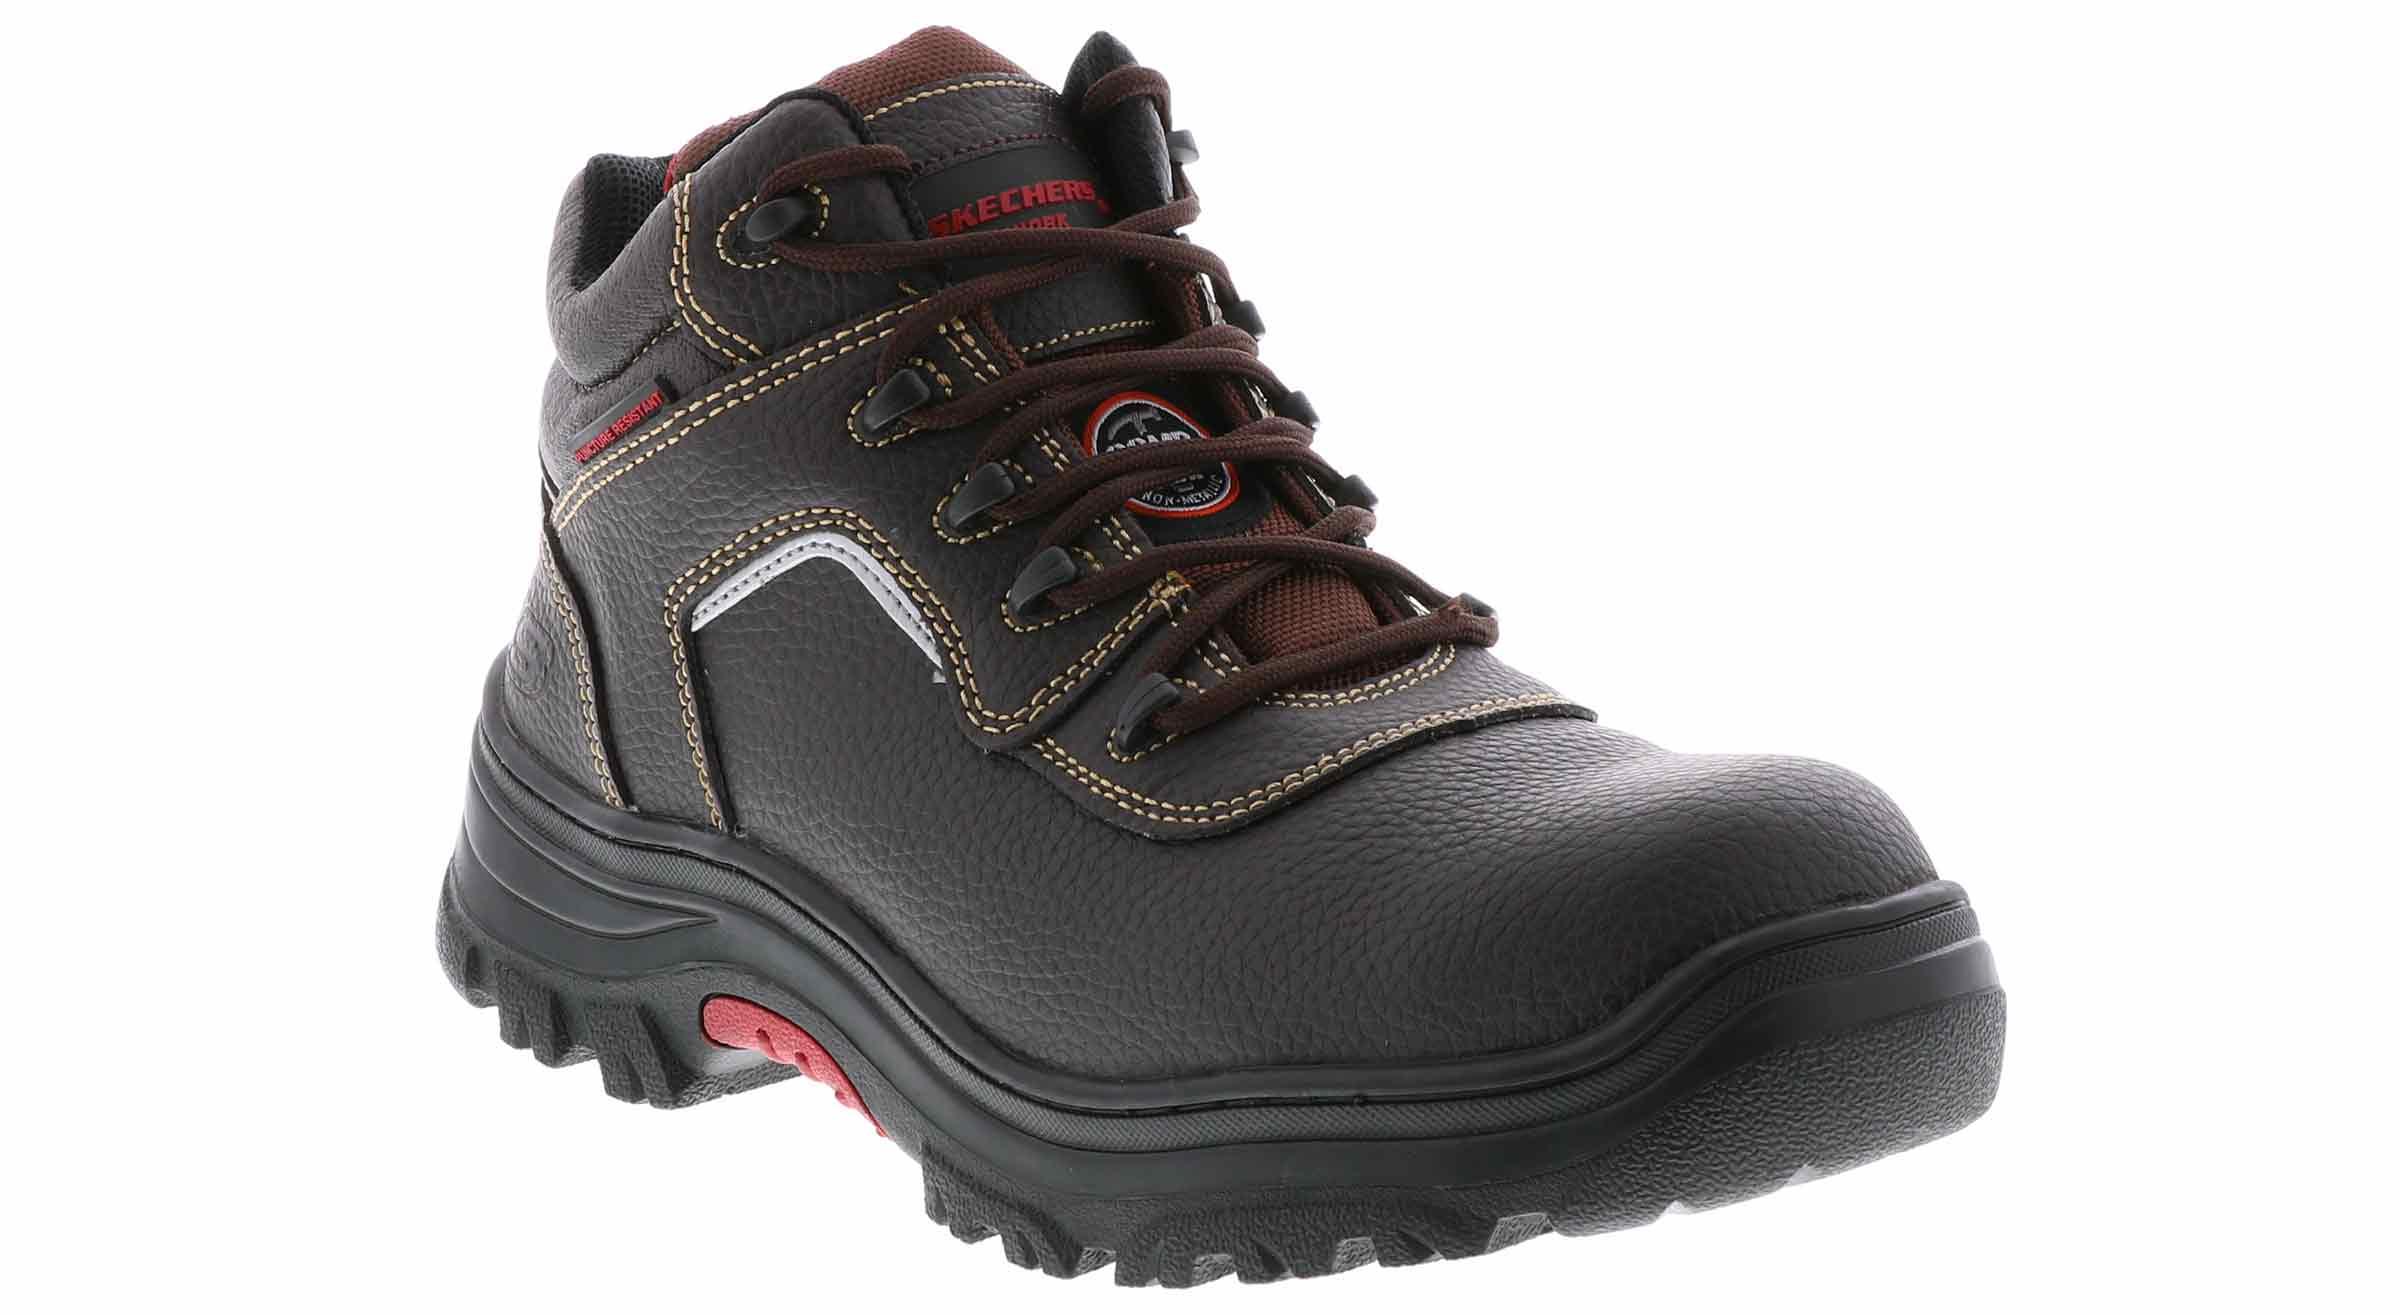 c65b5f35d13 Men's Skechers Burgin Sosder Comp Toe Dark brown | Shoe Sensation